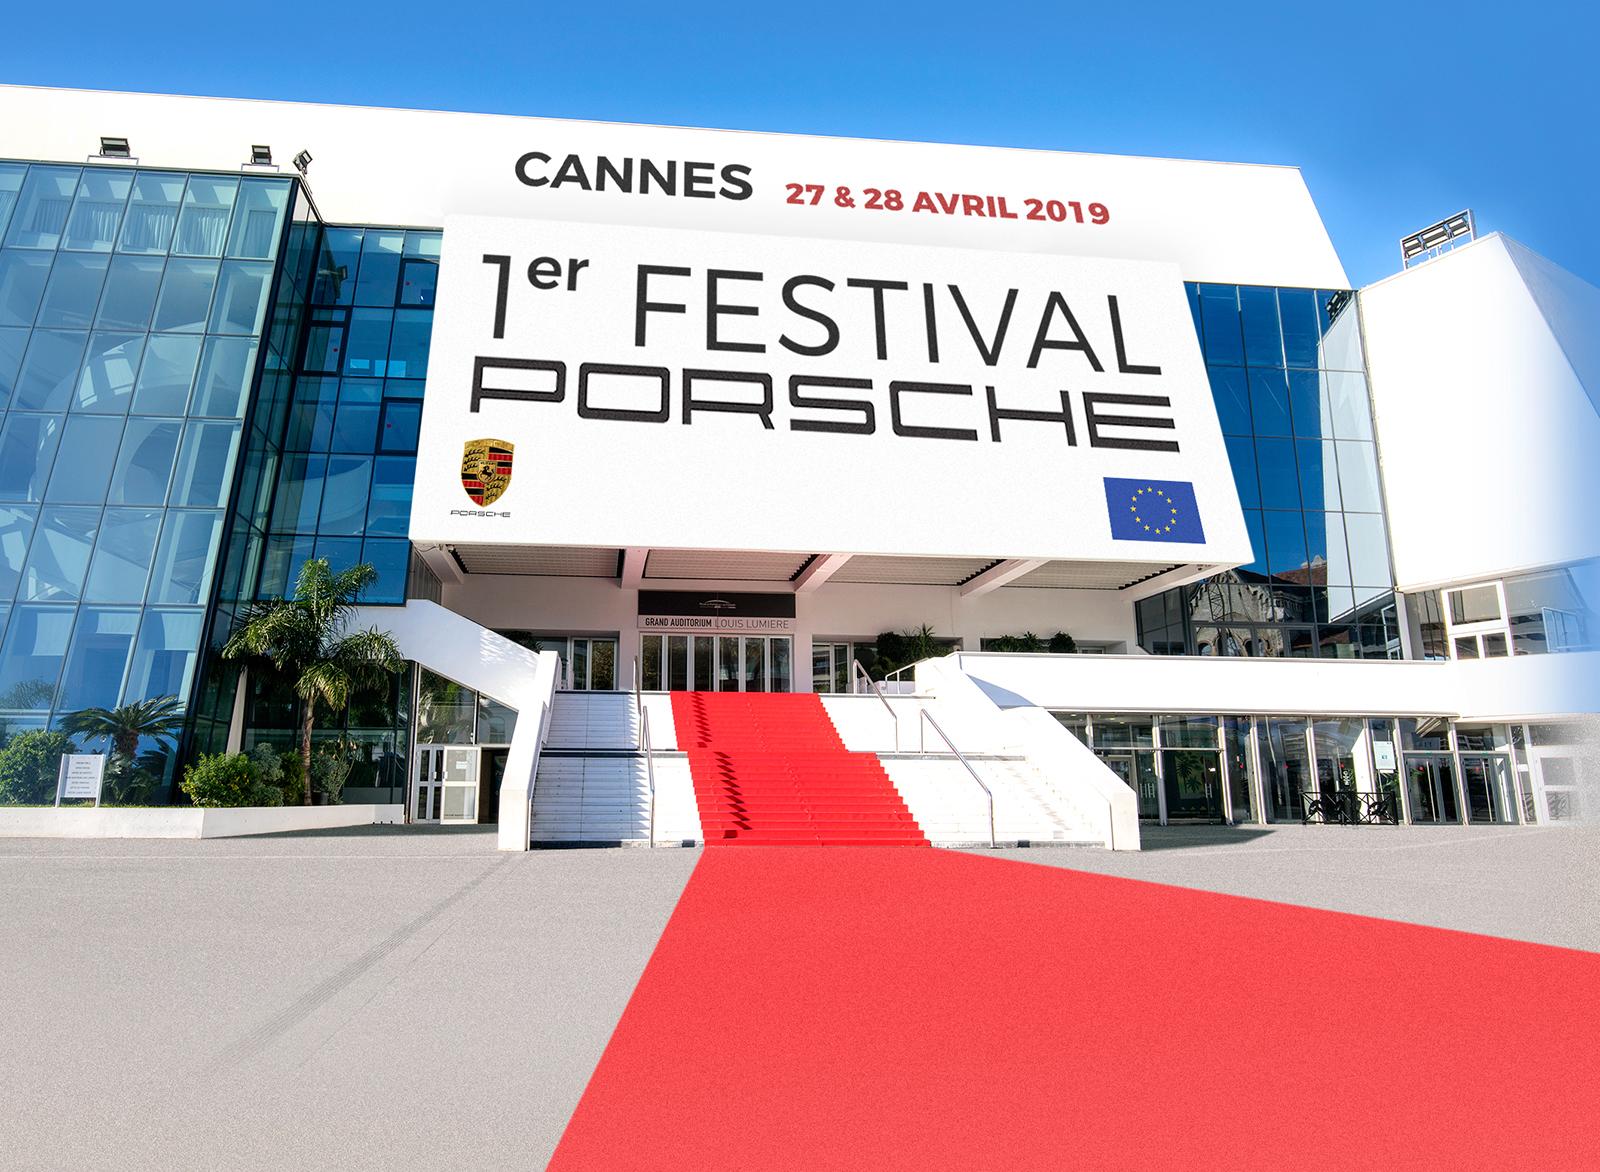 festival_porsche_cannes